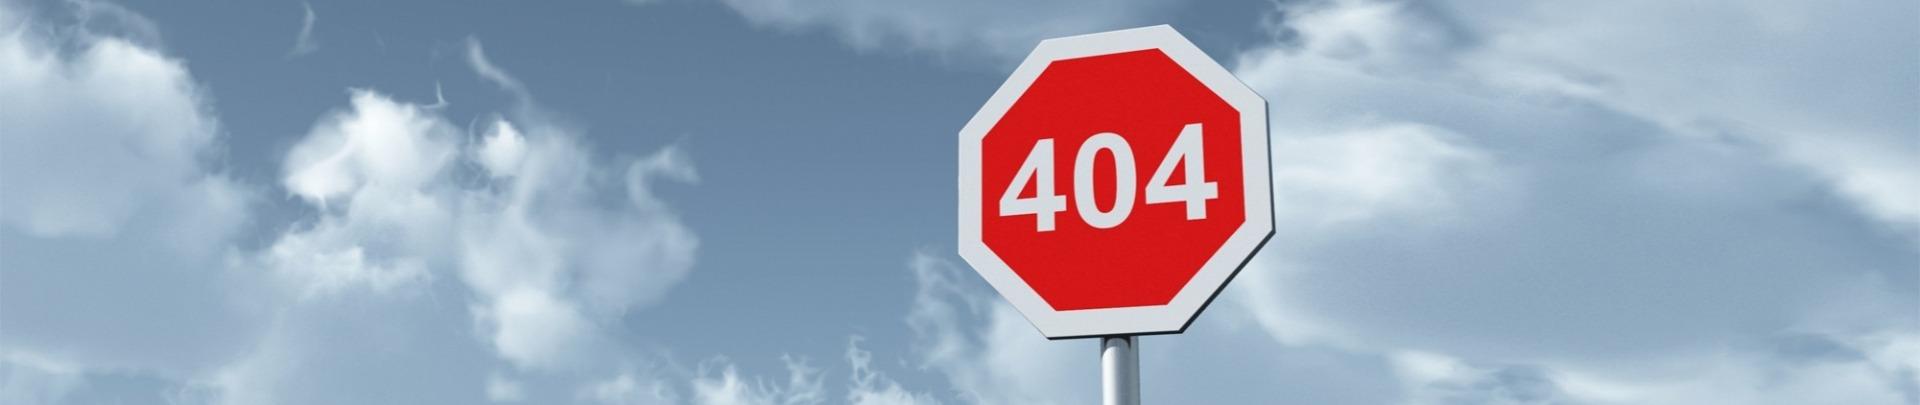 404 pagina niet gevonden